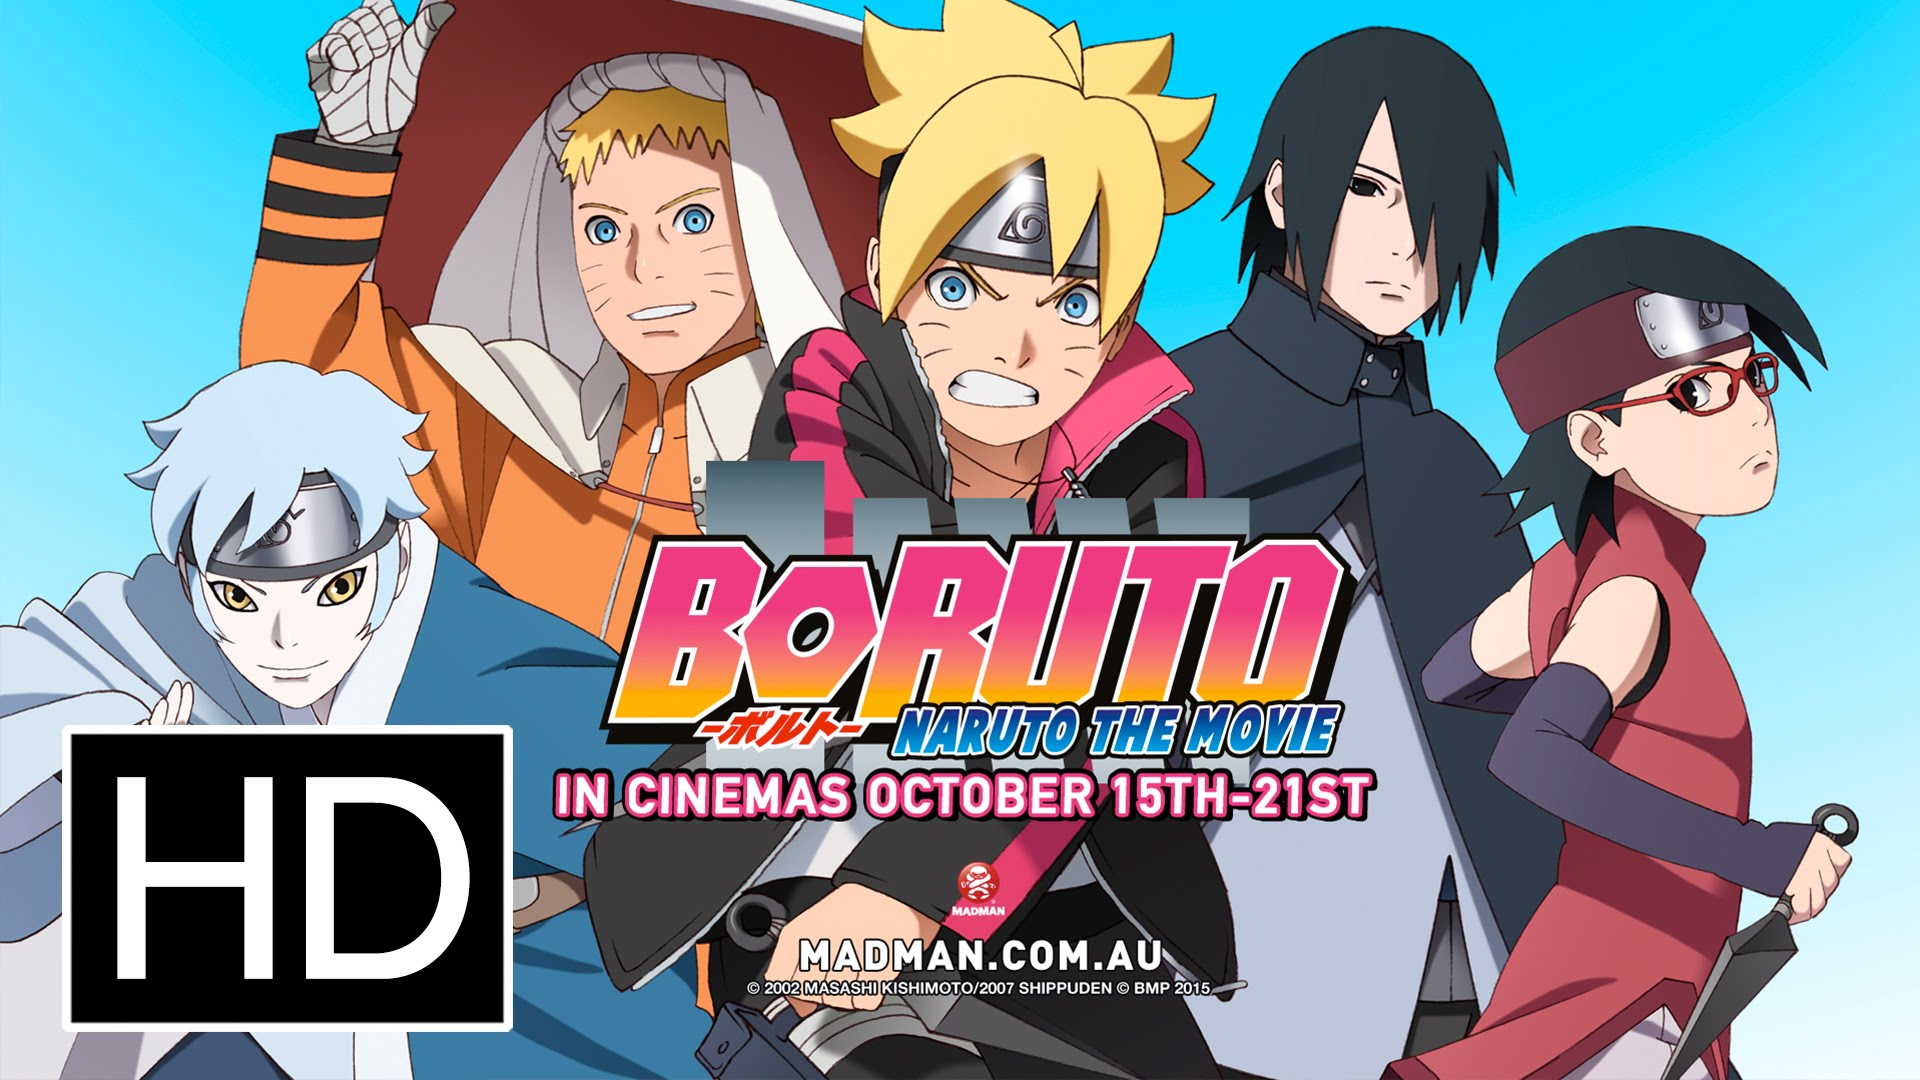 Boruto Naruto The Movie Wallpapers Anime Hq Boruto Naruto The Movie Pictures 4k Wallpapers 2019